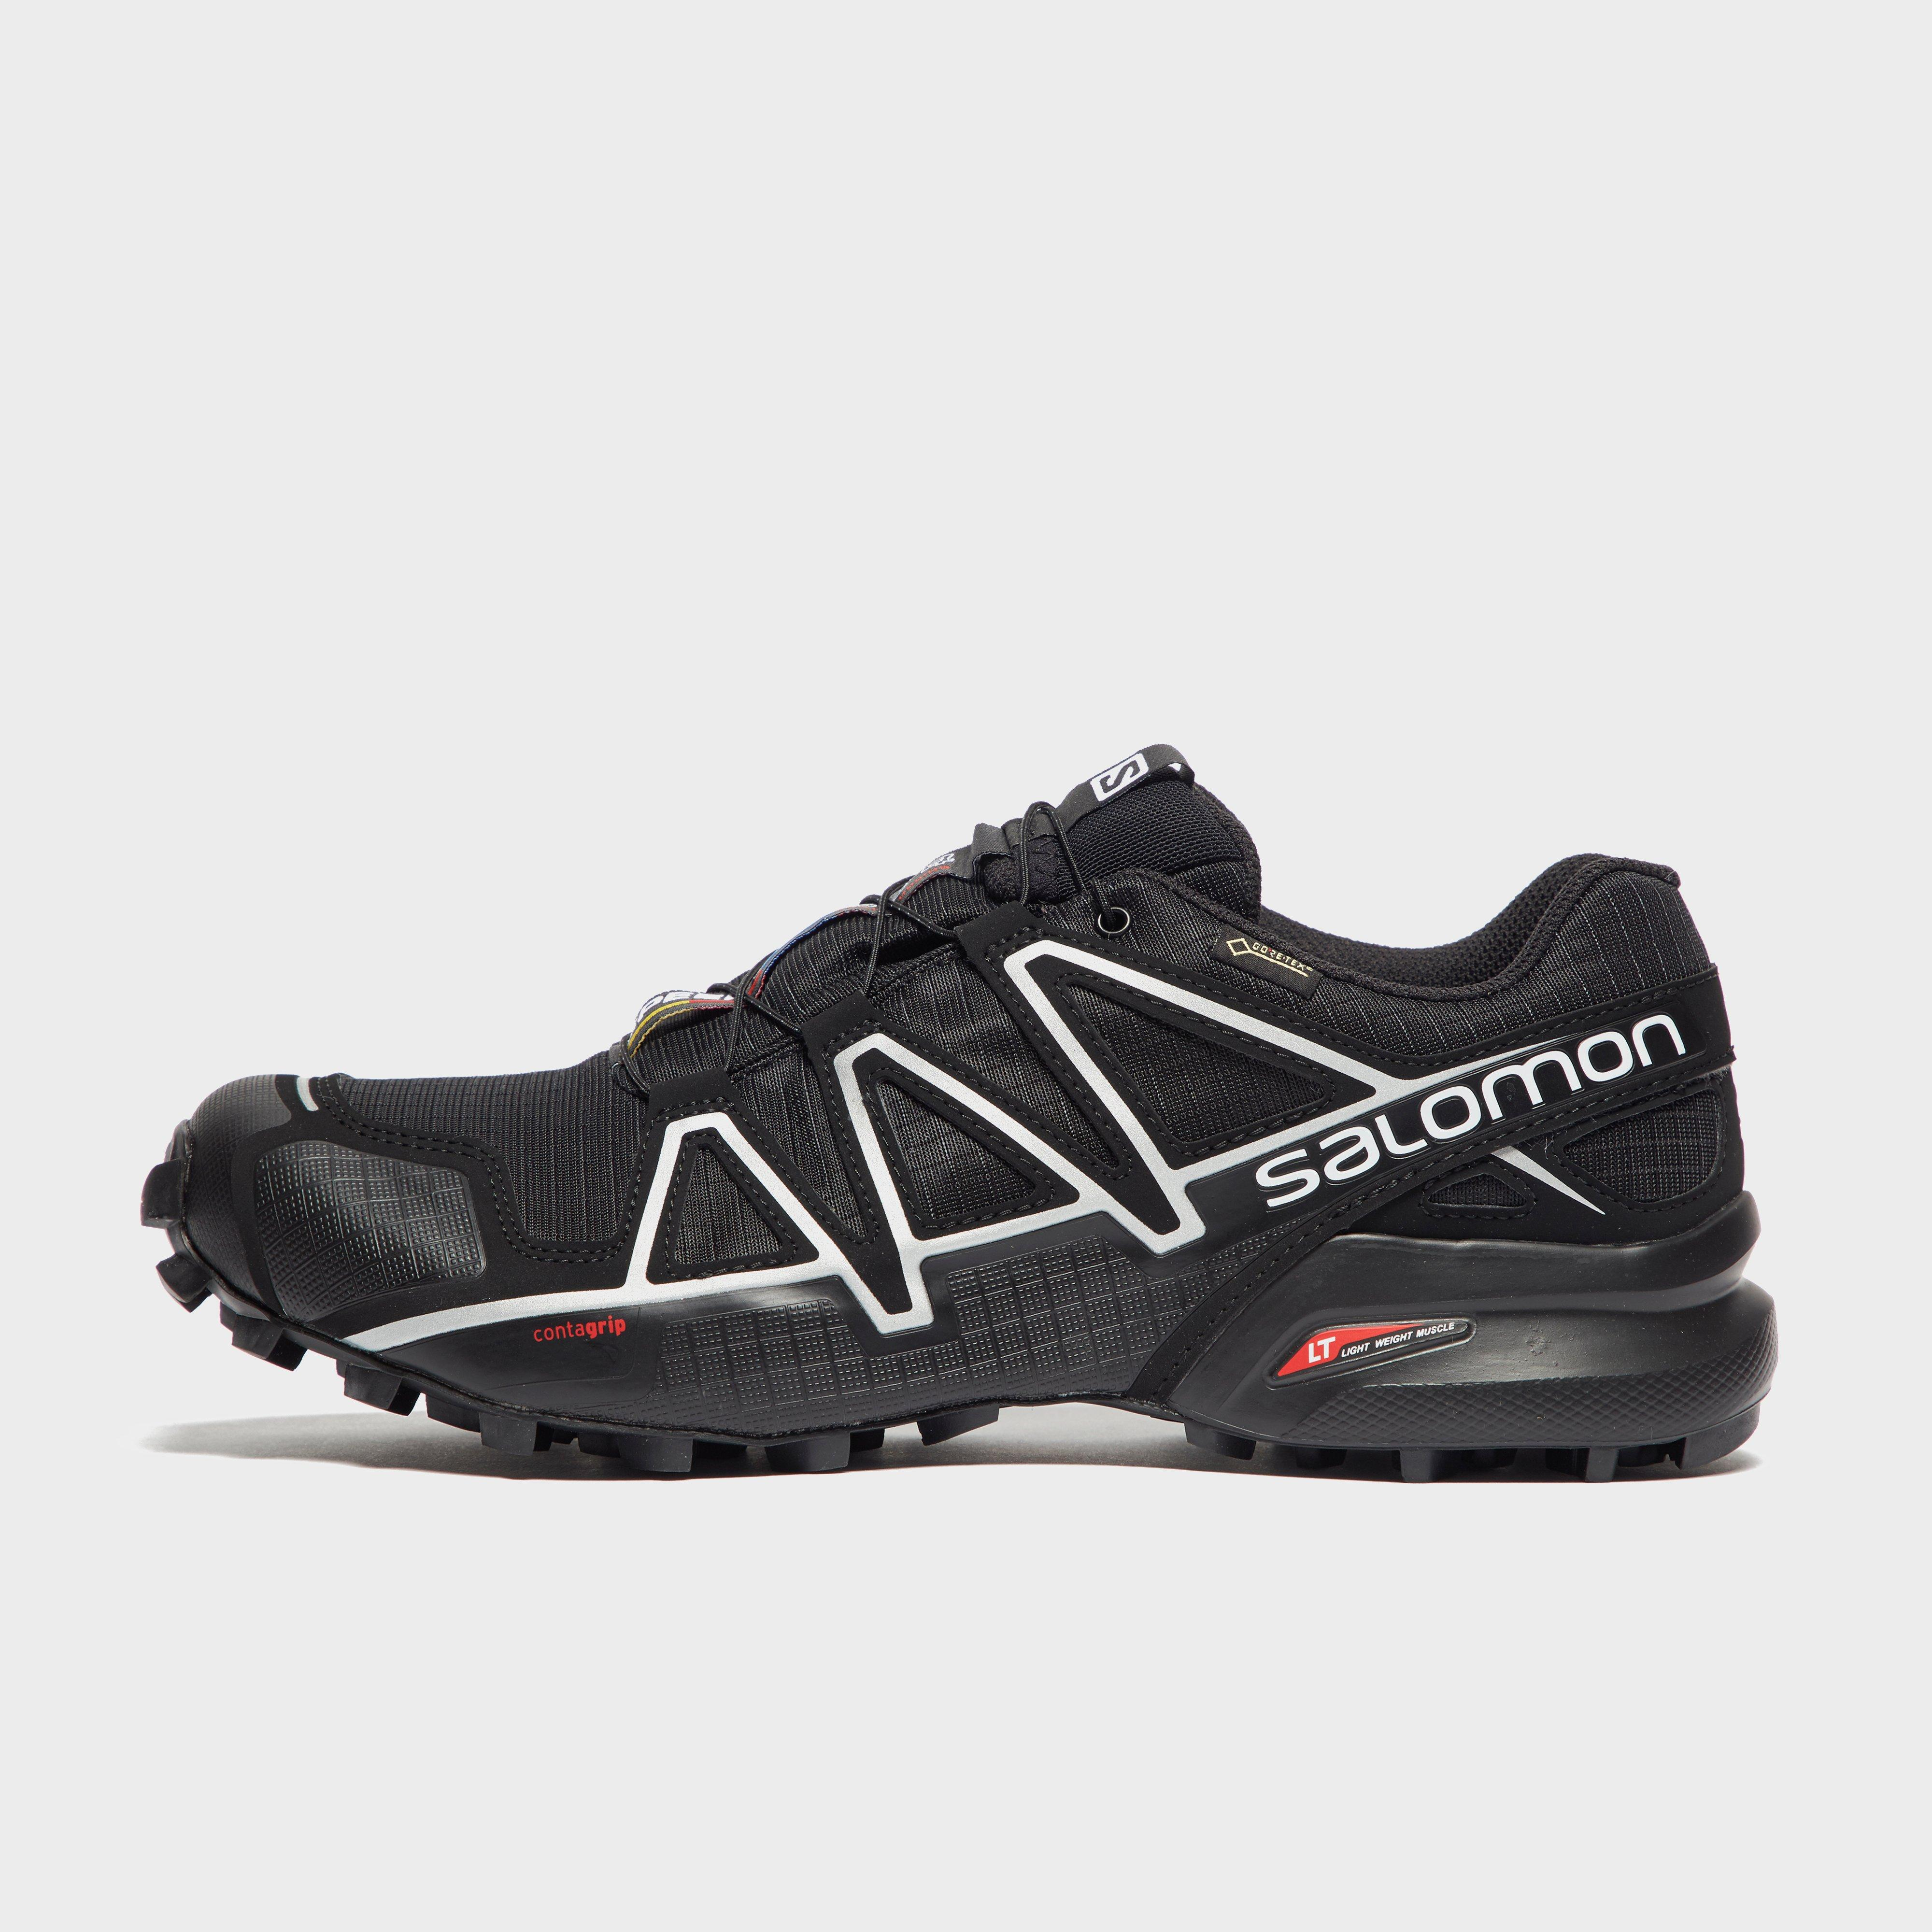 salomon wings flyte 2 womens trail running shoes 2018